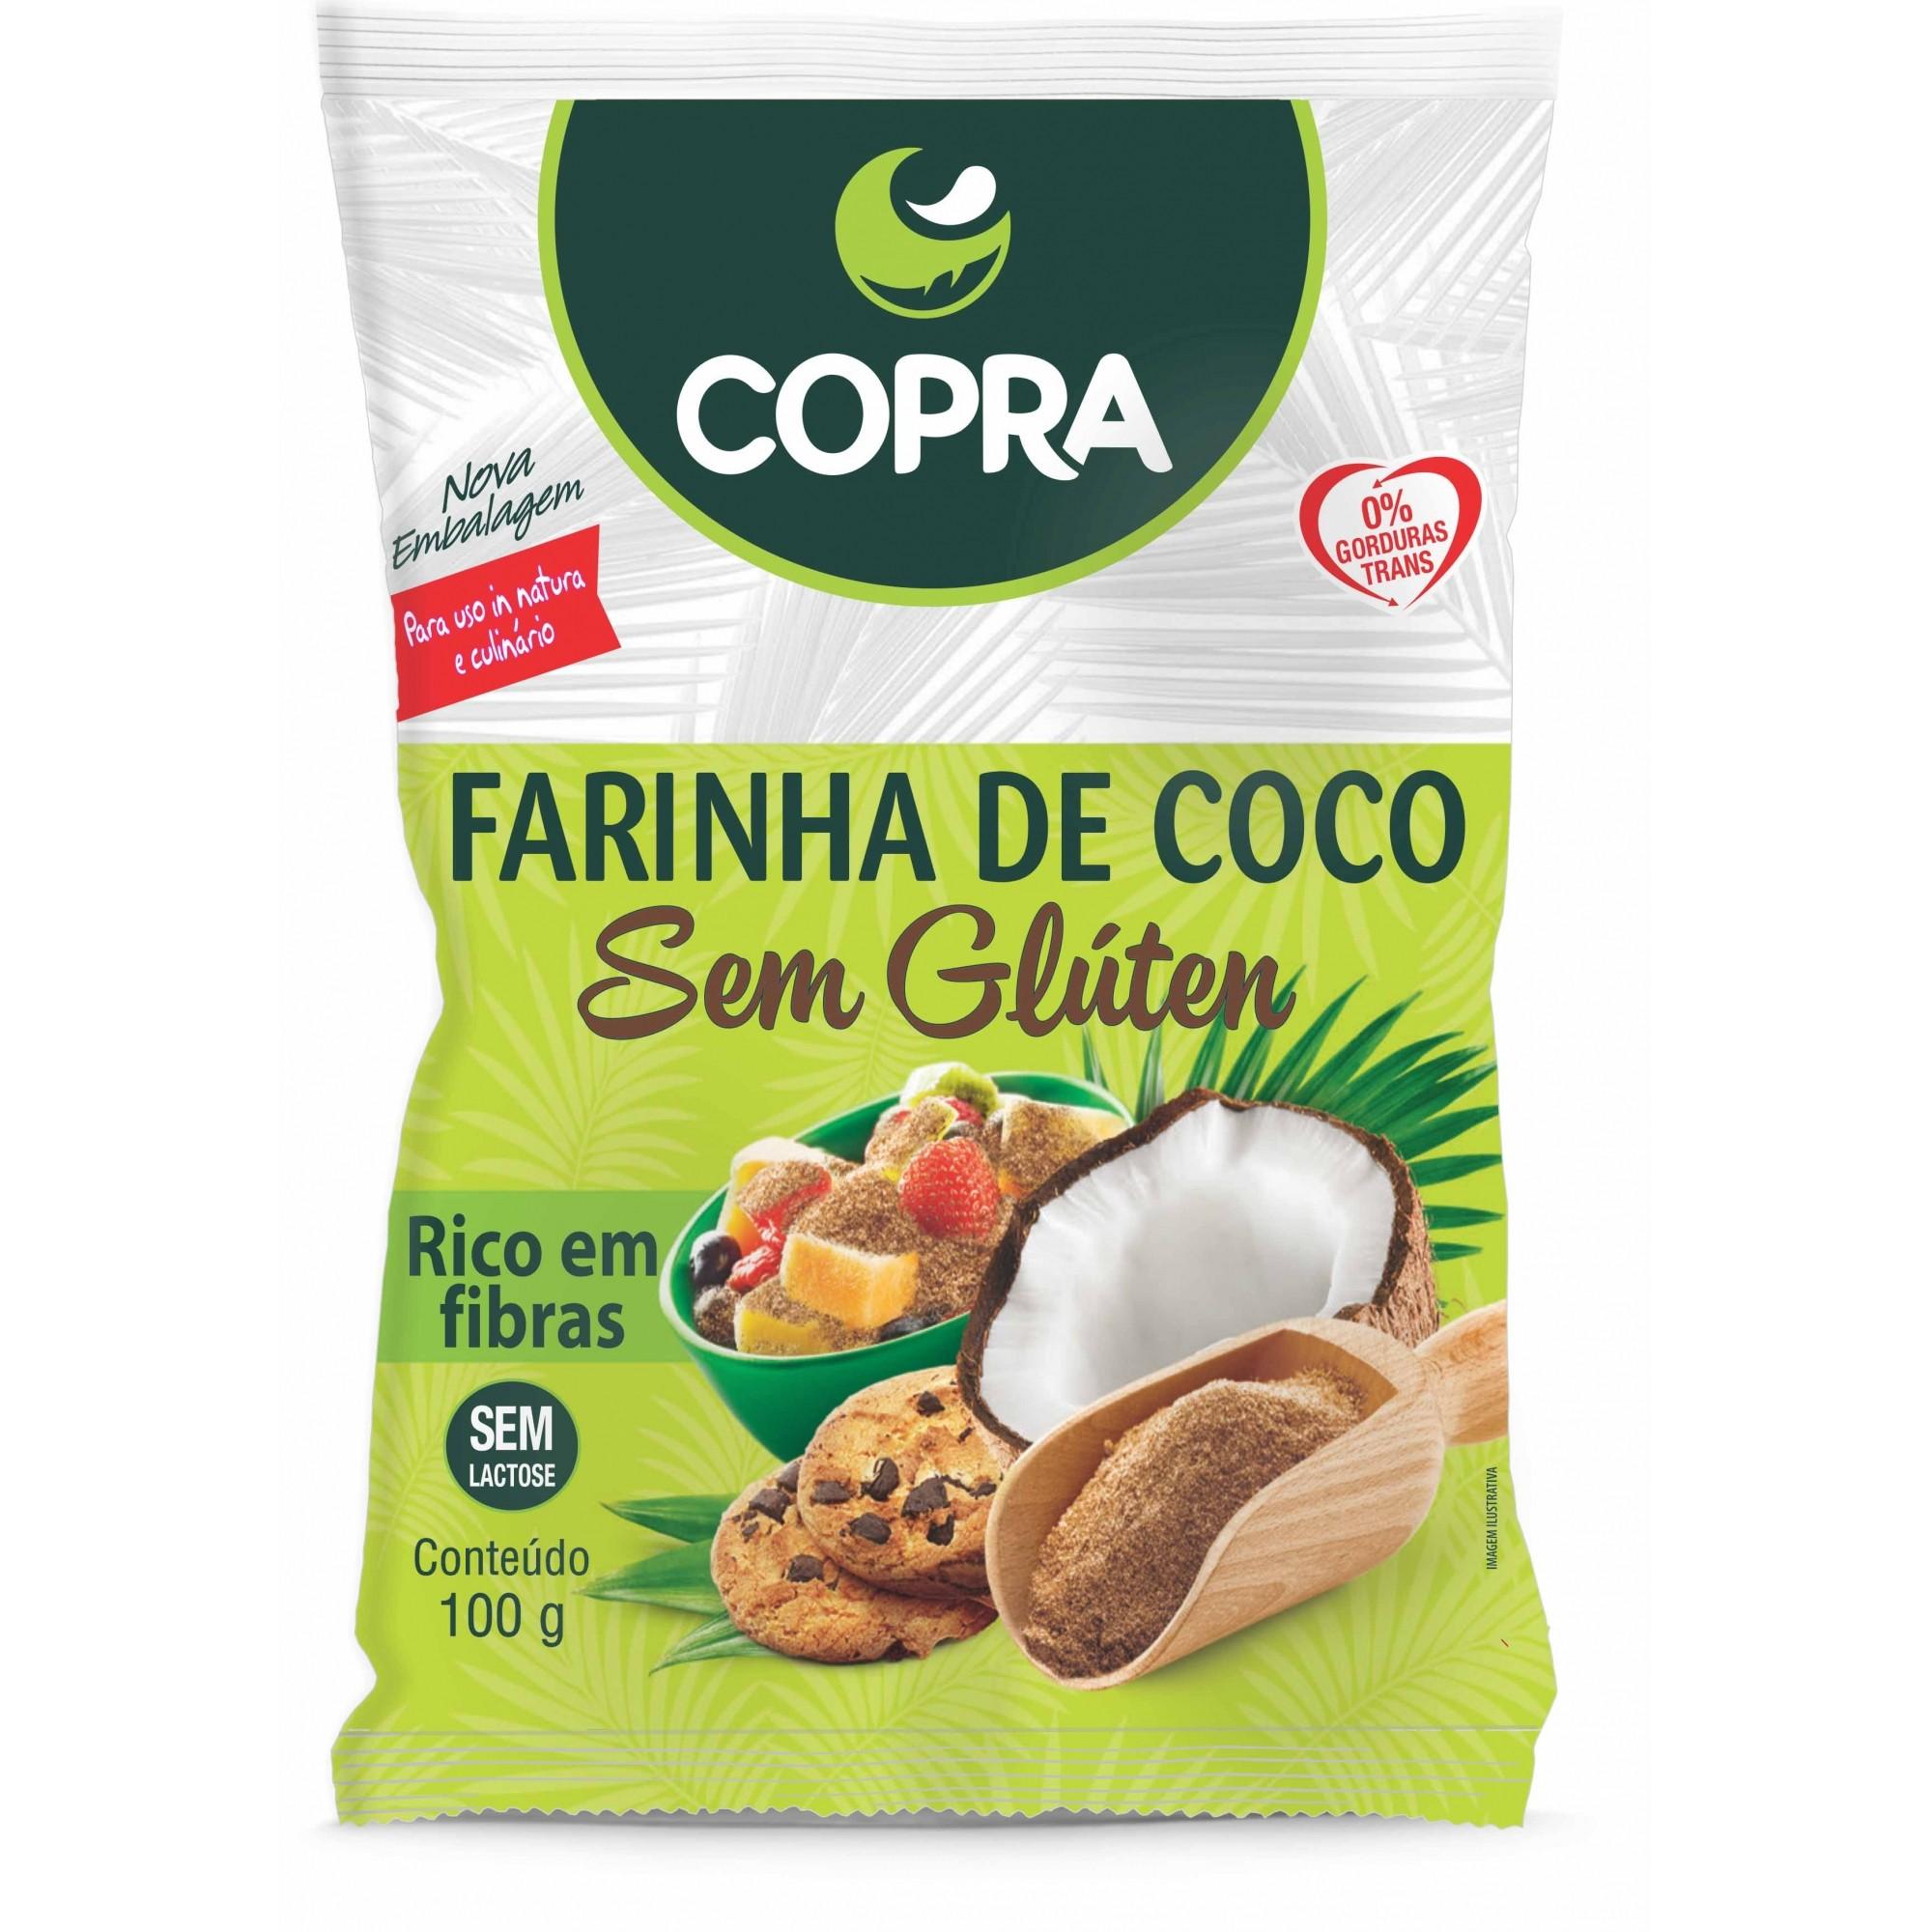 Farinha de Coco 100g s/ Glúten - Copra